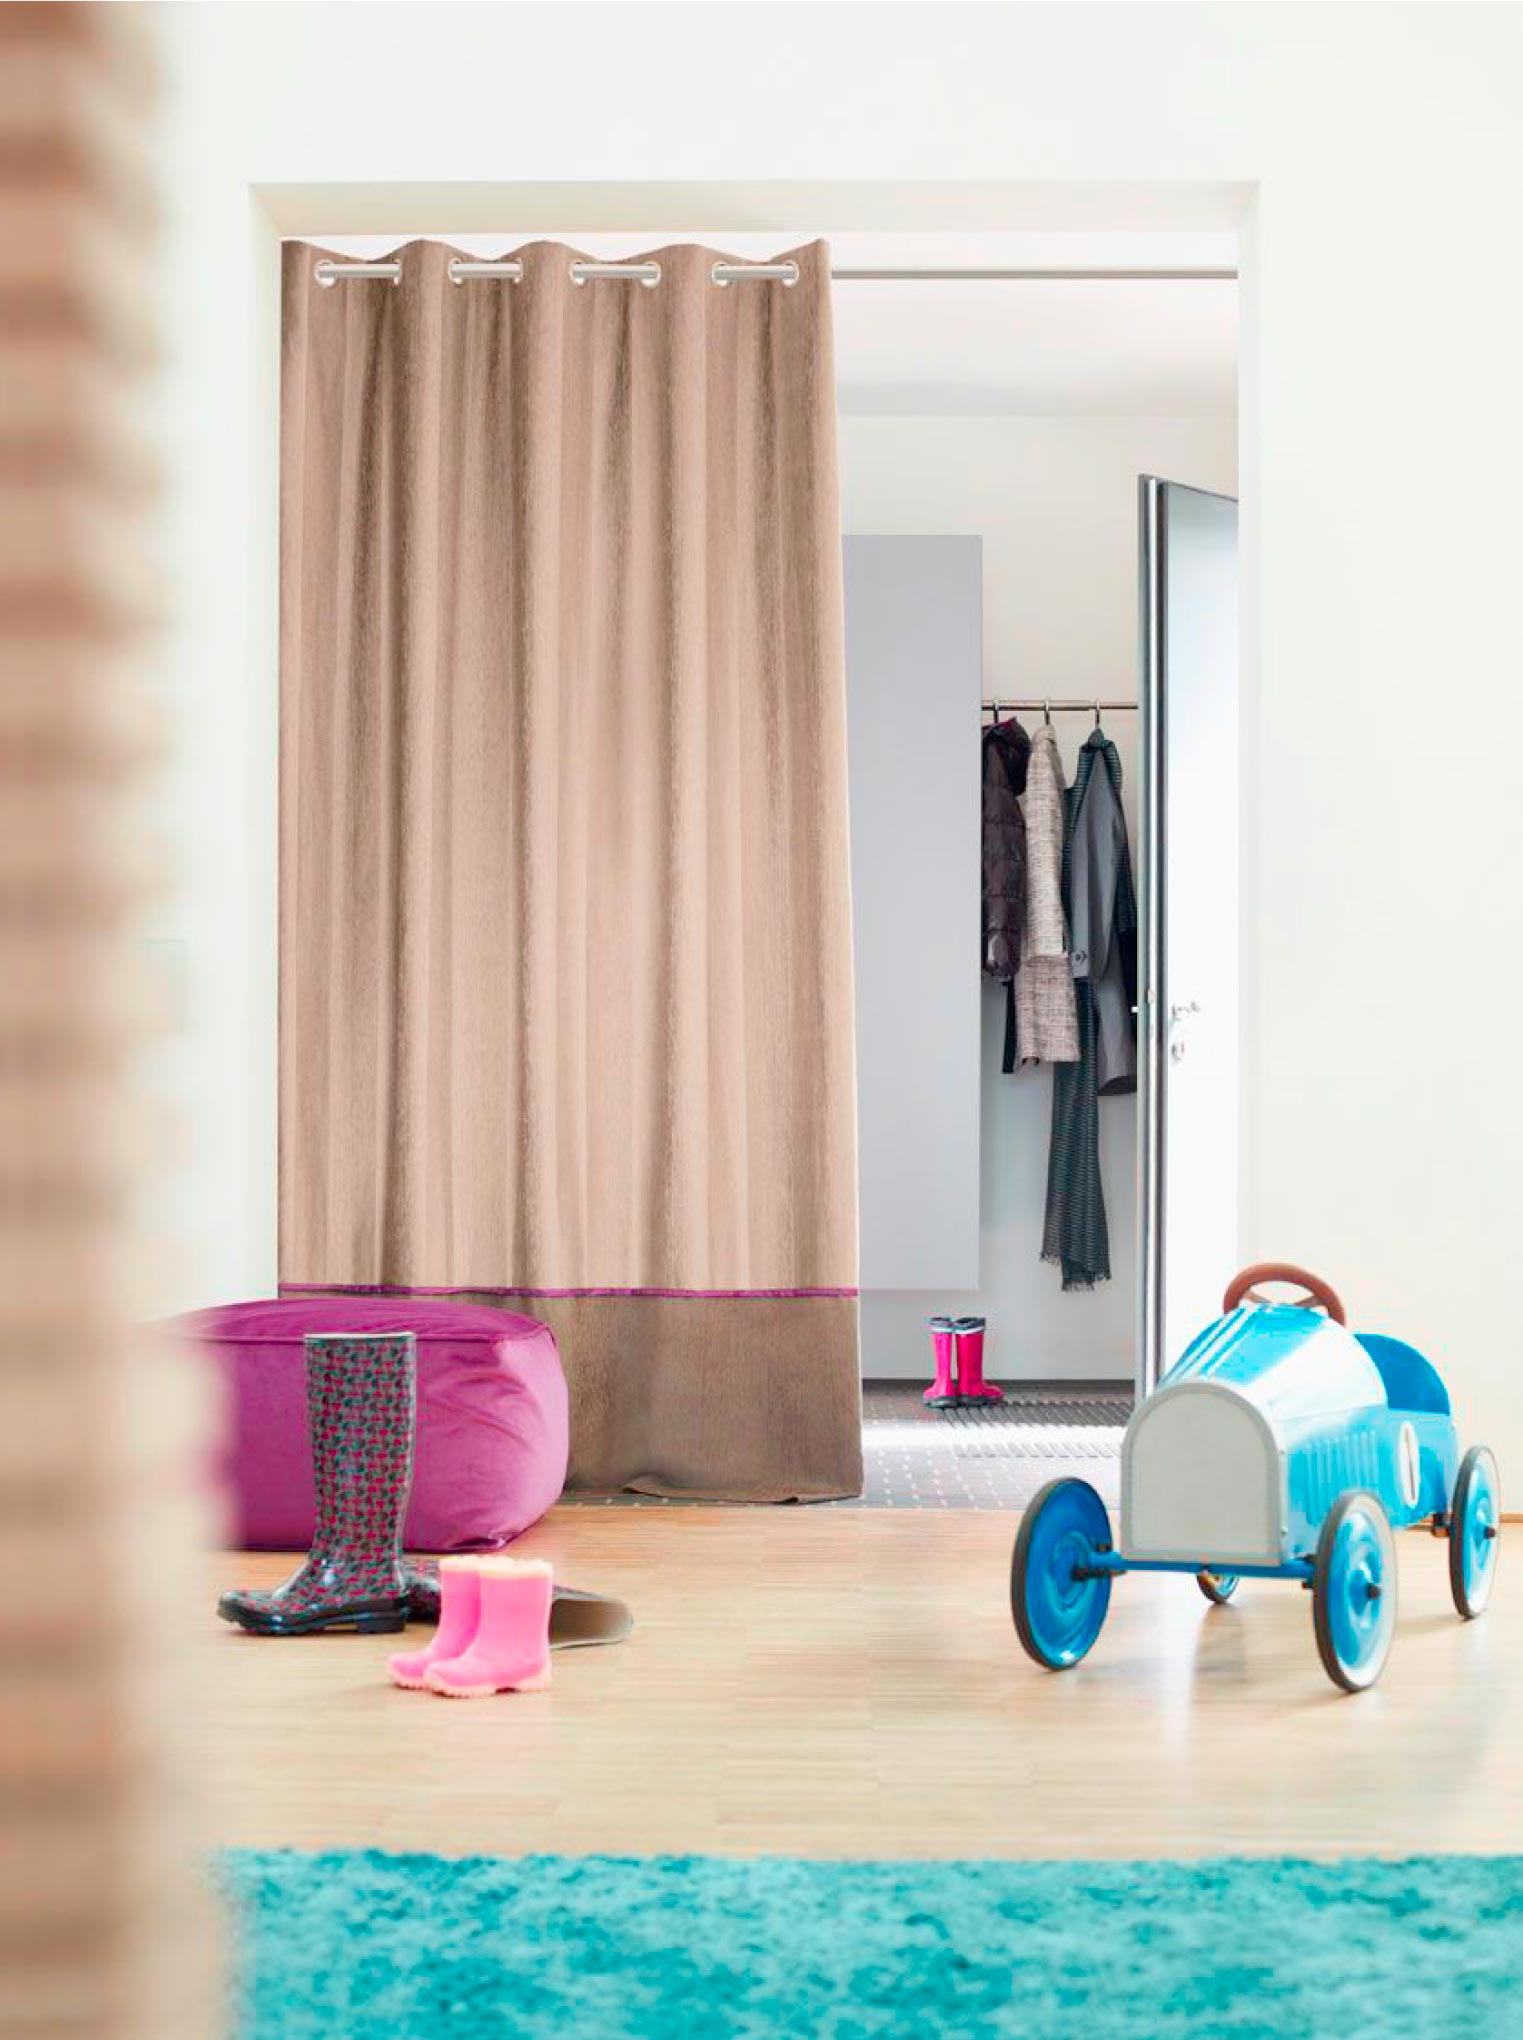 100 bad gardinen gardinen badezimmer home design. Black Bedroom Furniture Sets. Home Design Ideas